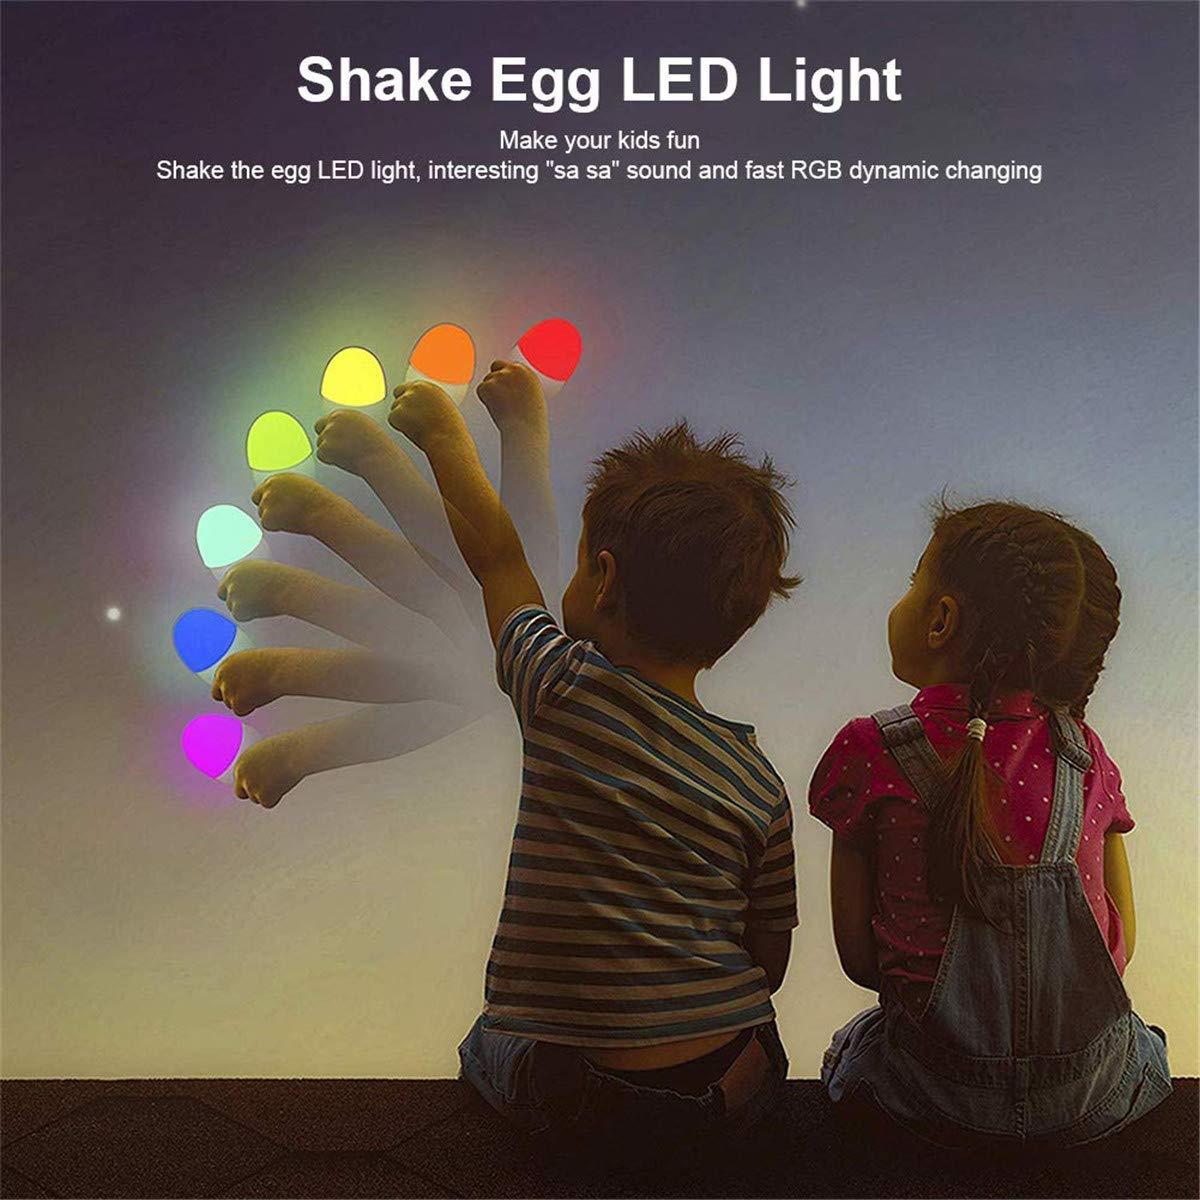 Luz de Nocturna LED Lámpara de Mesita de Noche Inteligente, Control Tactil, Regulable, USB Recargable, Portátil, Cambio de Color RGB para Niños, Habitación, Cámping - Uverbon